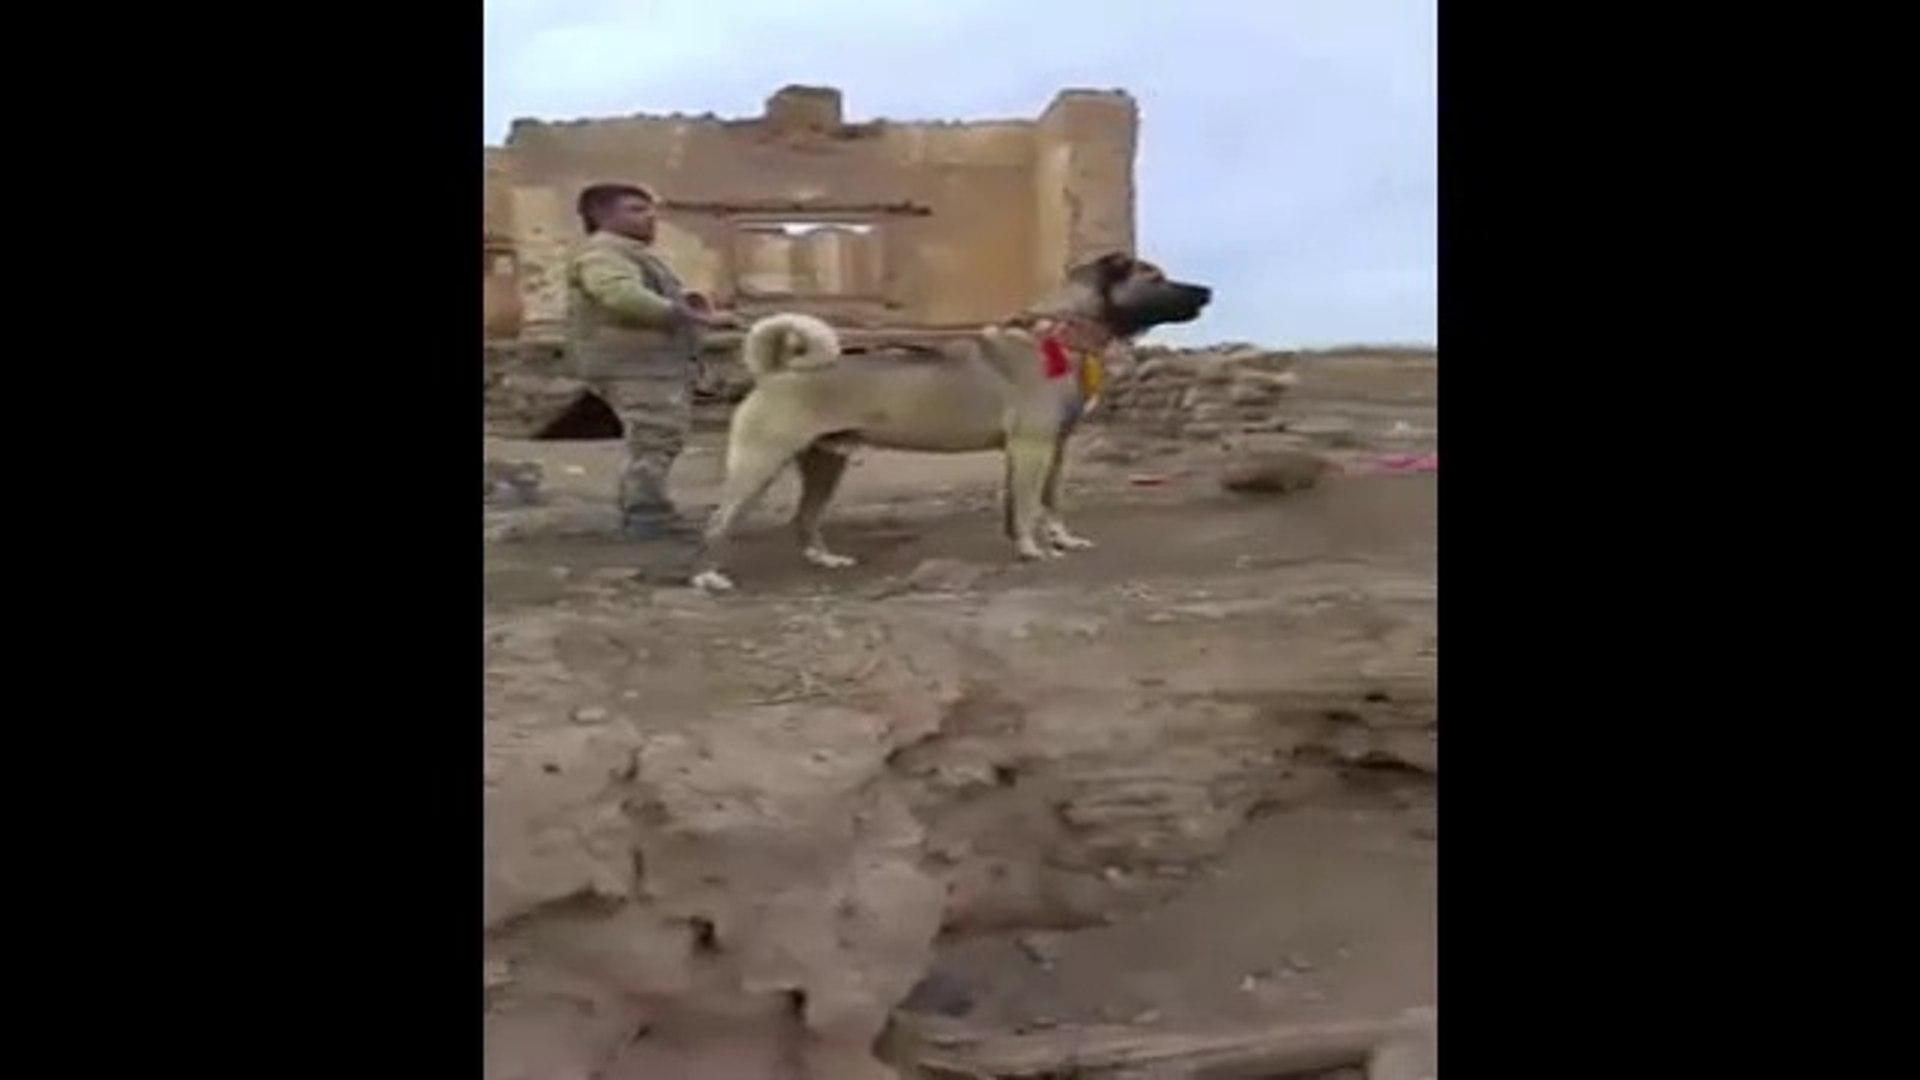 4*4 DEV ANADOLU COBAN KOPEGi - 4*4 GiANT ANATOLiAN SHEPHERD DOG